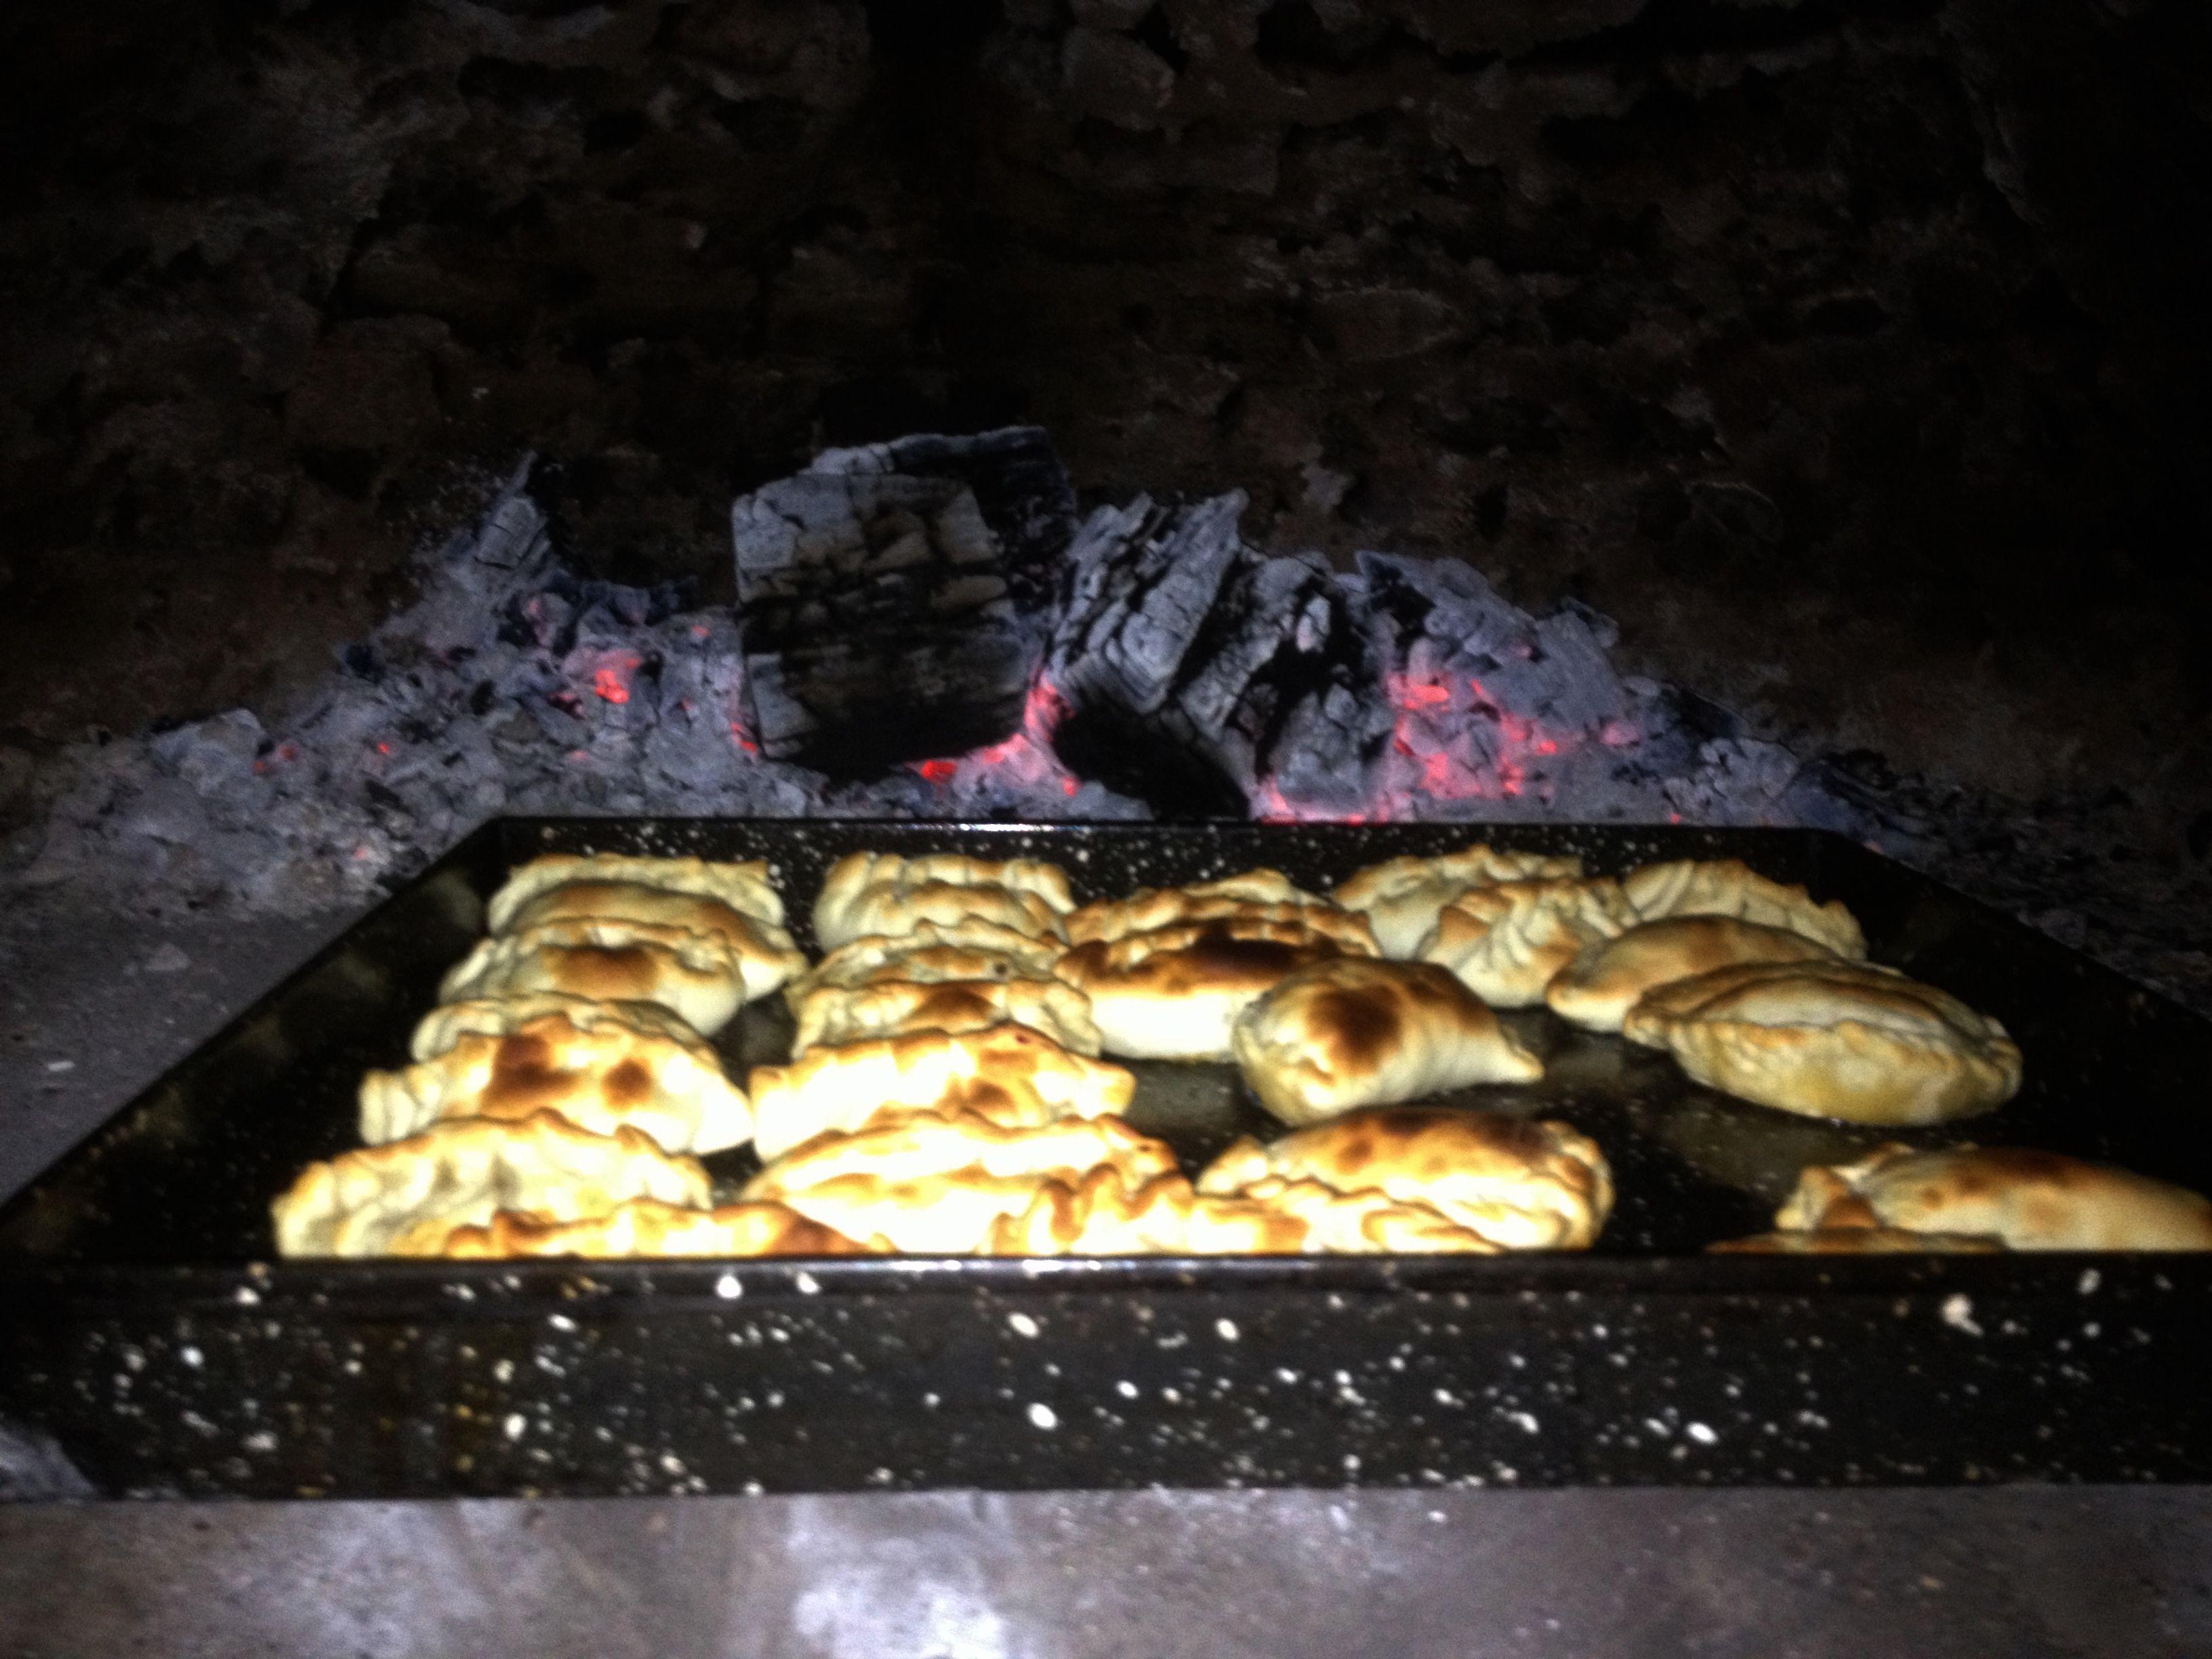 Empanadas al Horno de barro